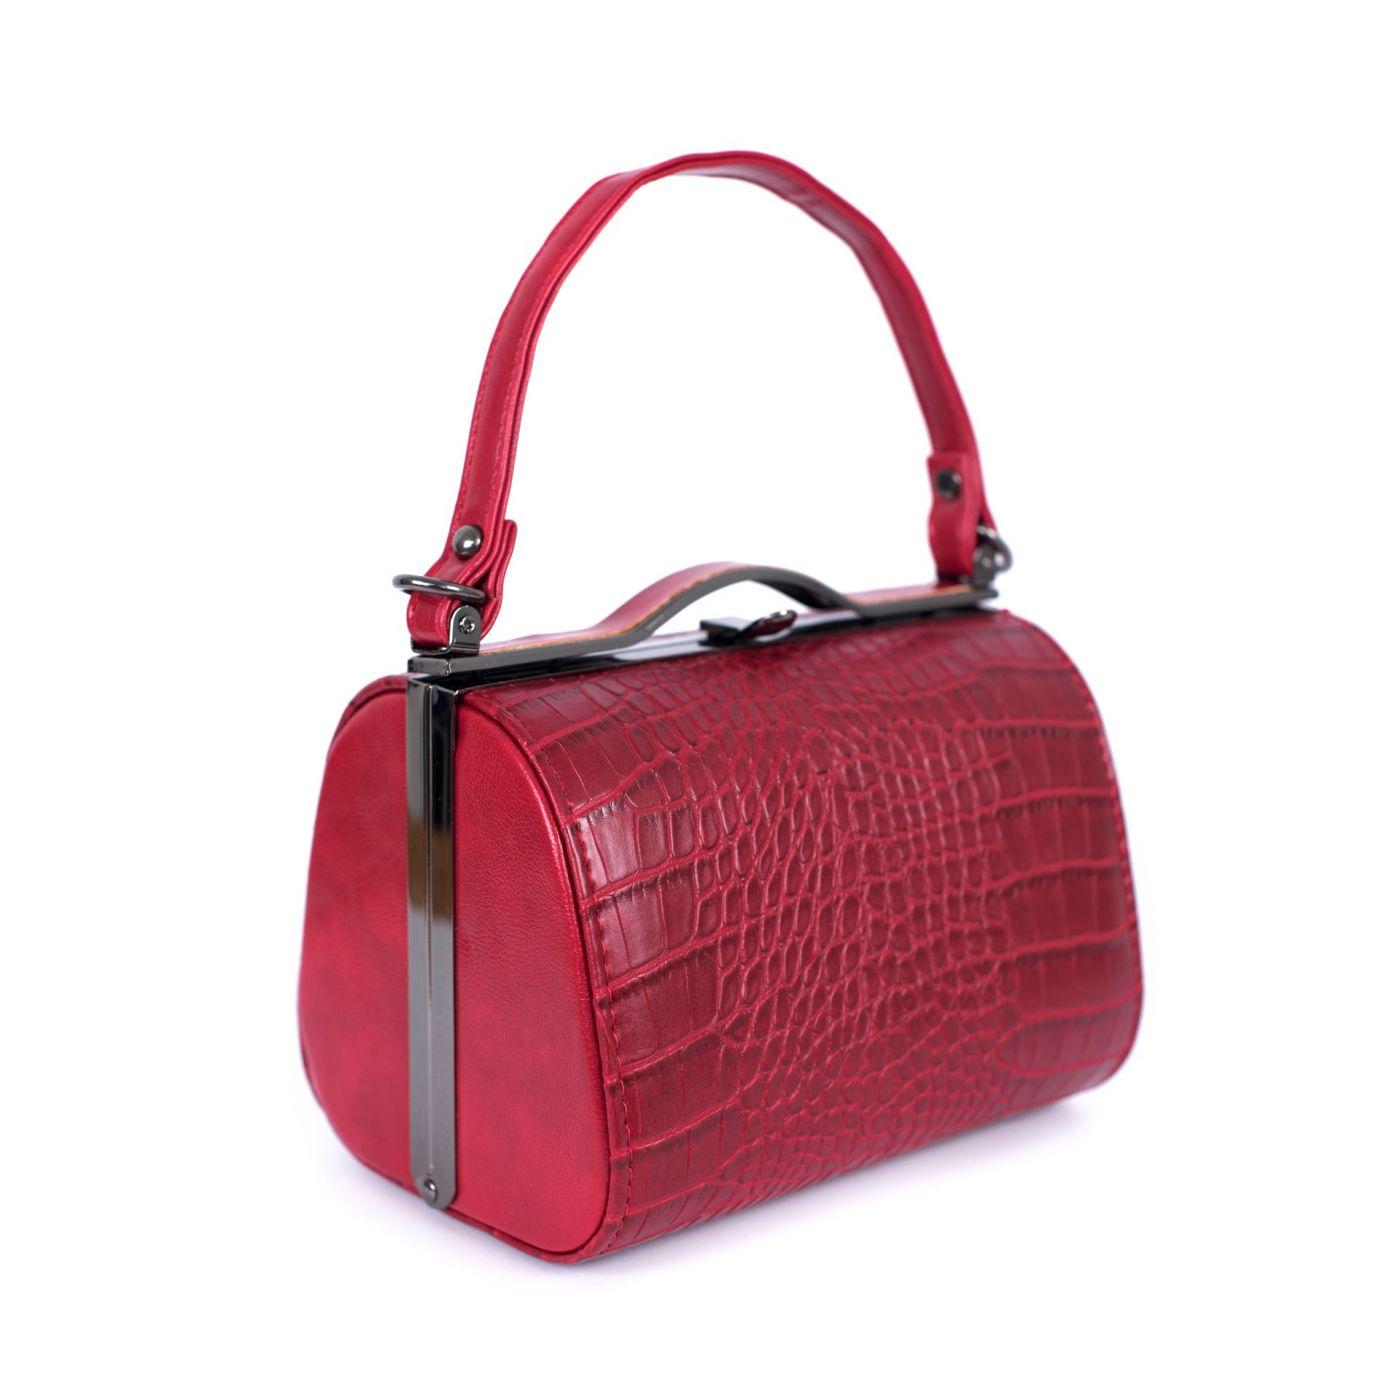 Art Of Polo Woman's Bag tr19544 Dark